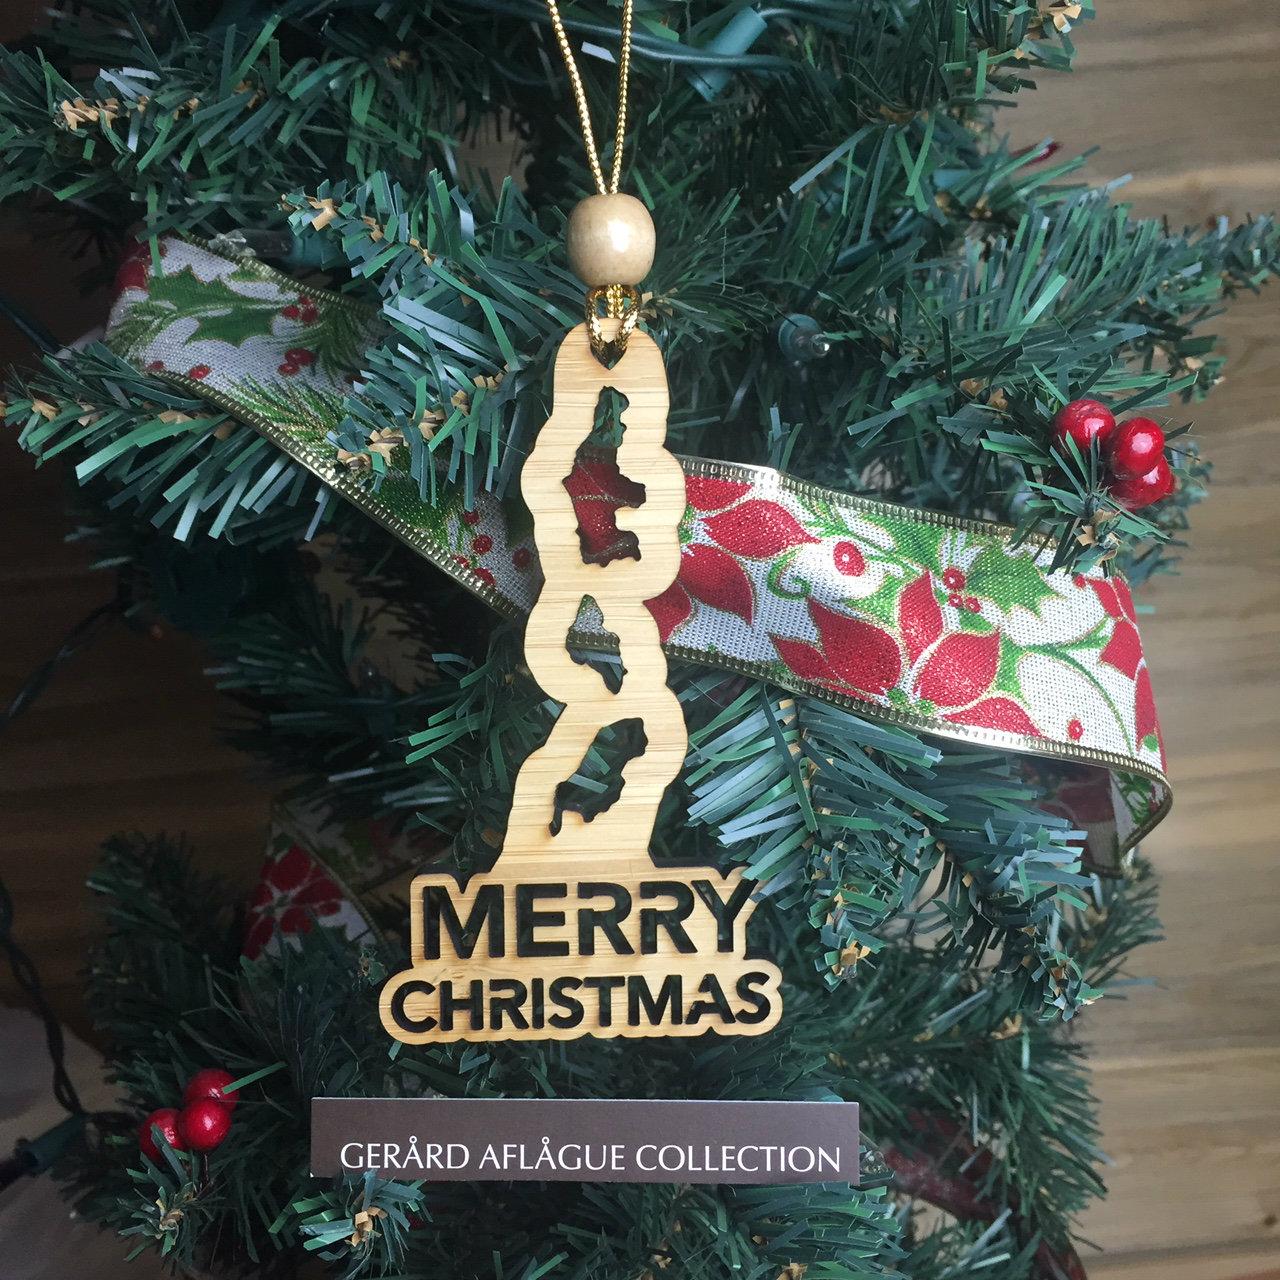 Island Christmas Tree.New Cnmi Islands Christmas Tree Ornament Chamorro